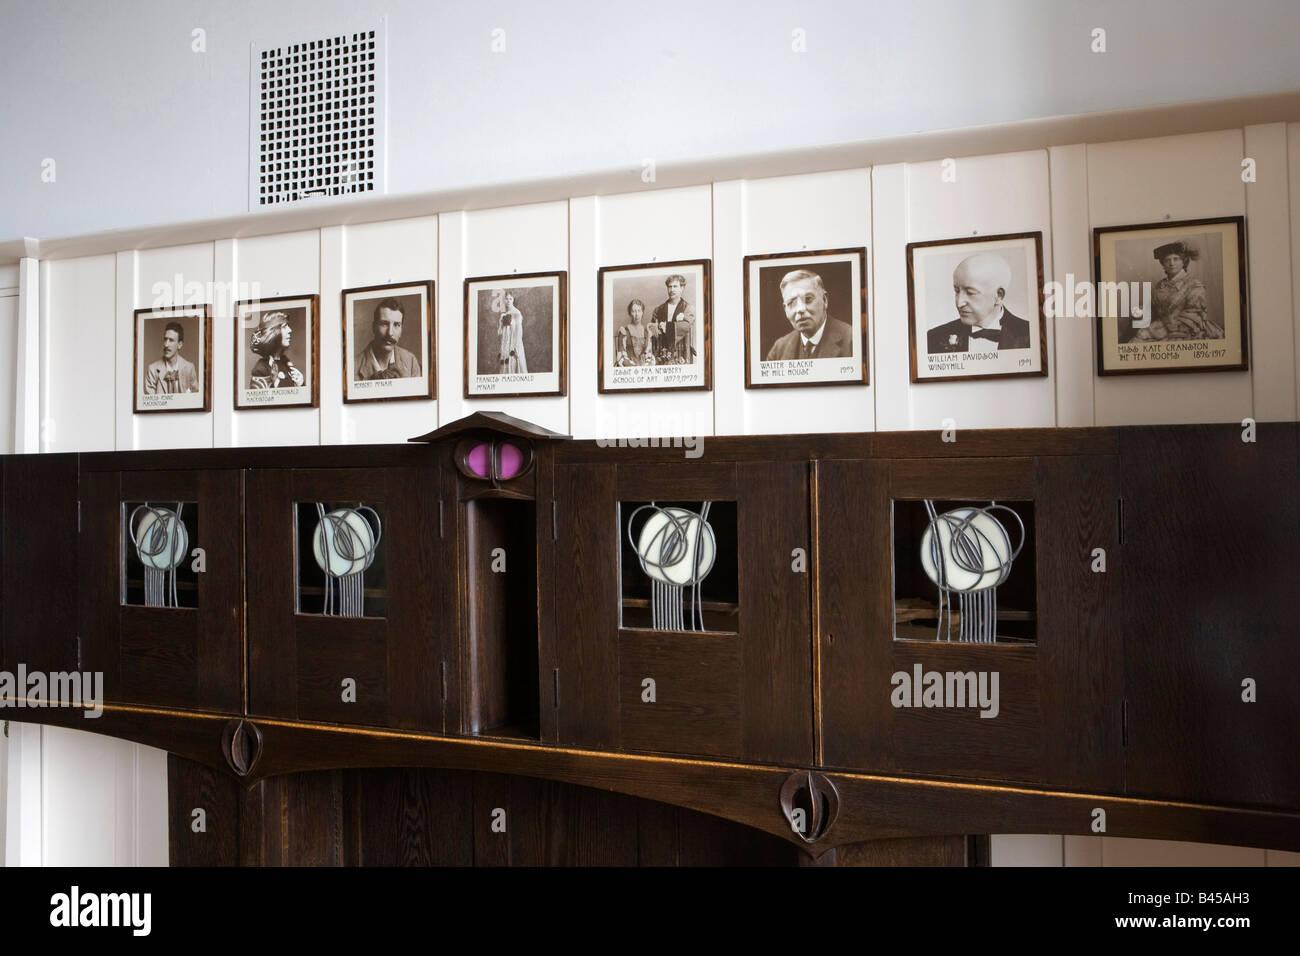 Schottische Möbel uk schottland glasgow of innen ehemaligen sitzungssaal